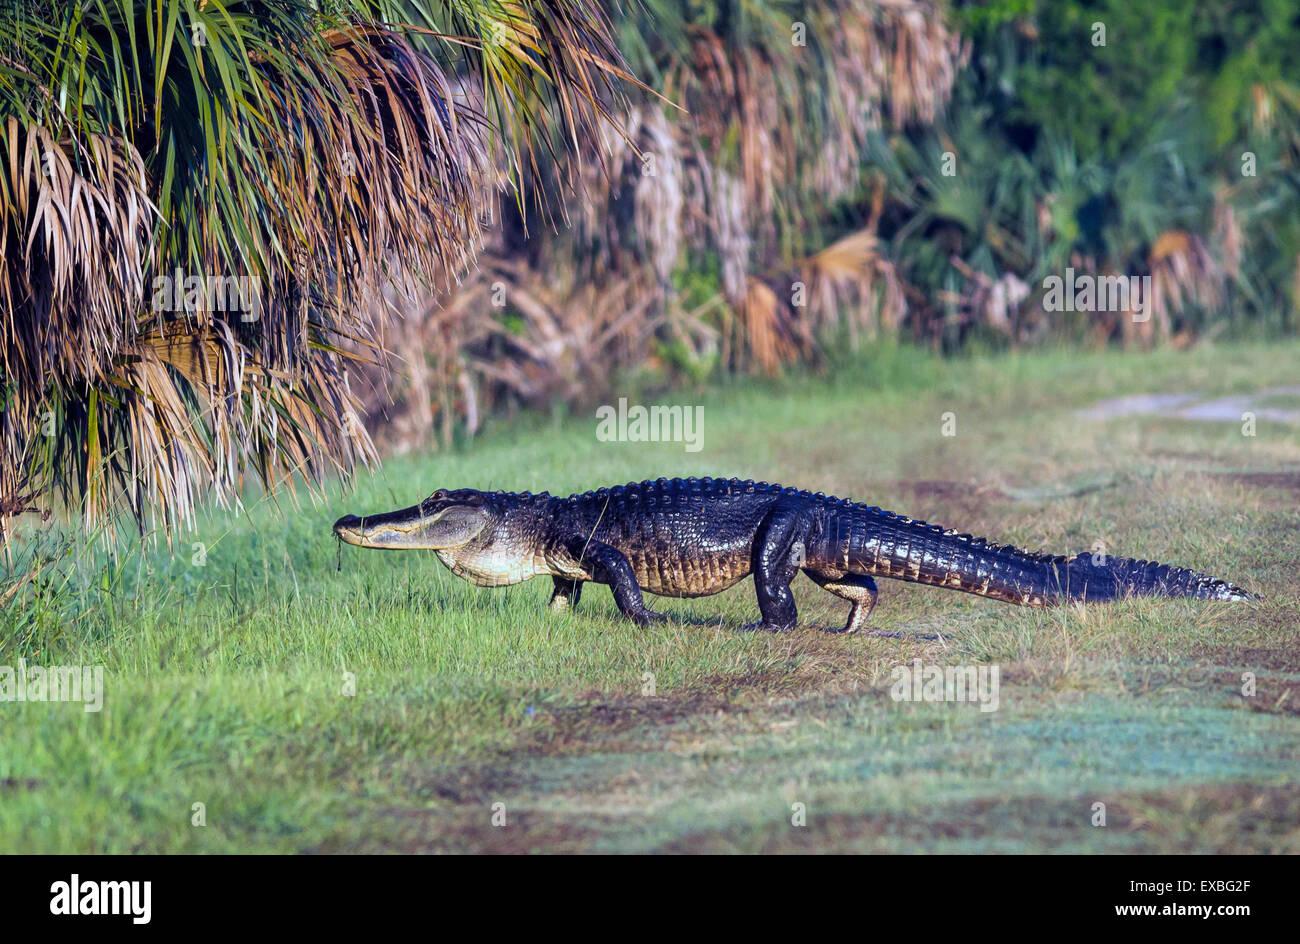 Gator crossing. - Stock Image